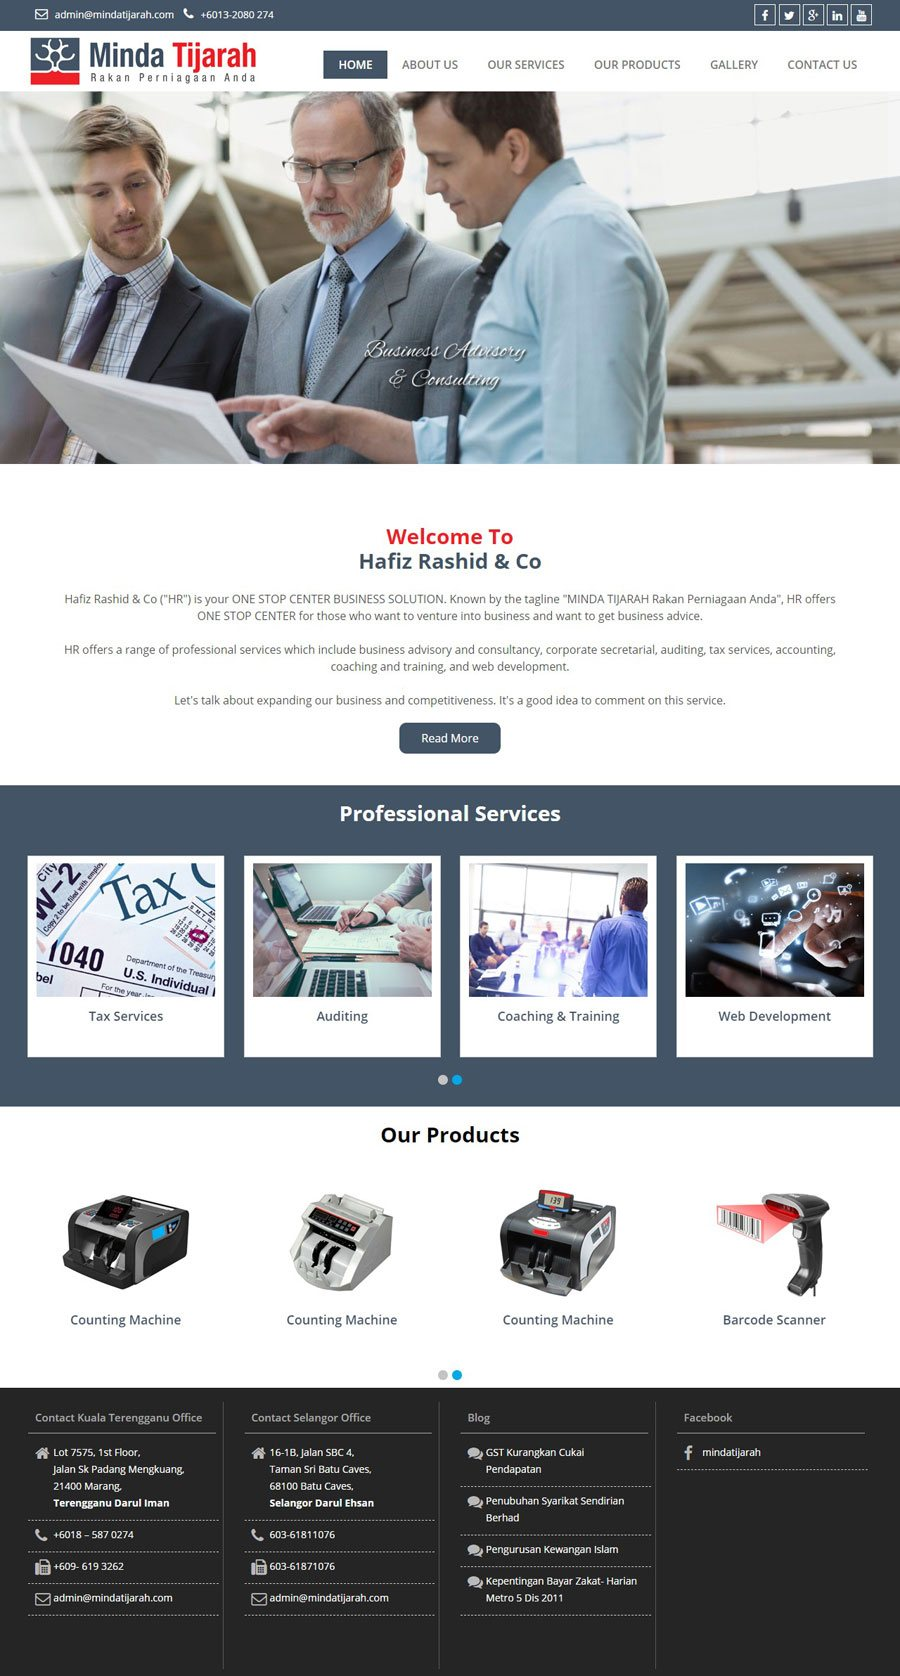 MINDA TIJARAH - Web Design Portfolio